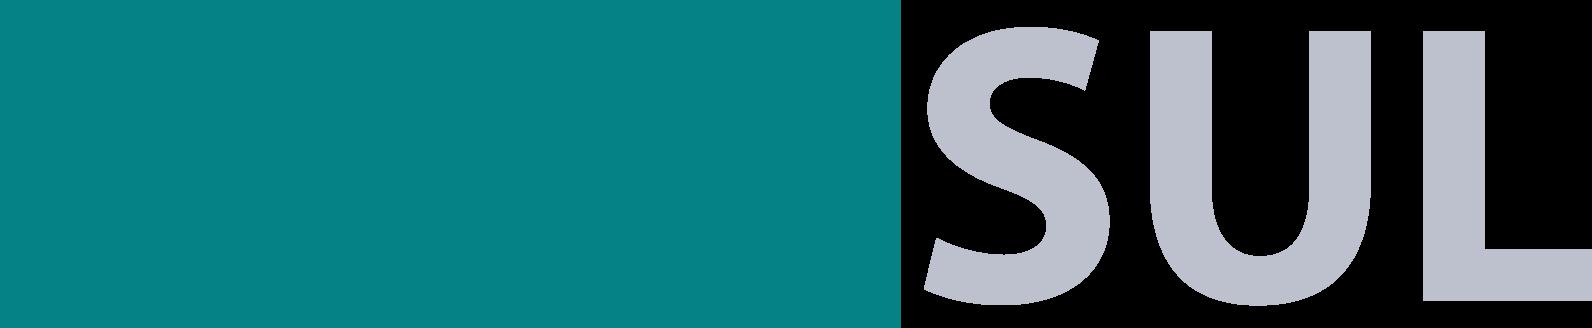 konsul logo.fw